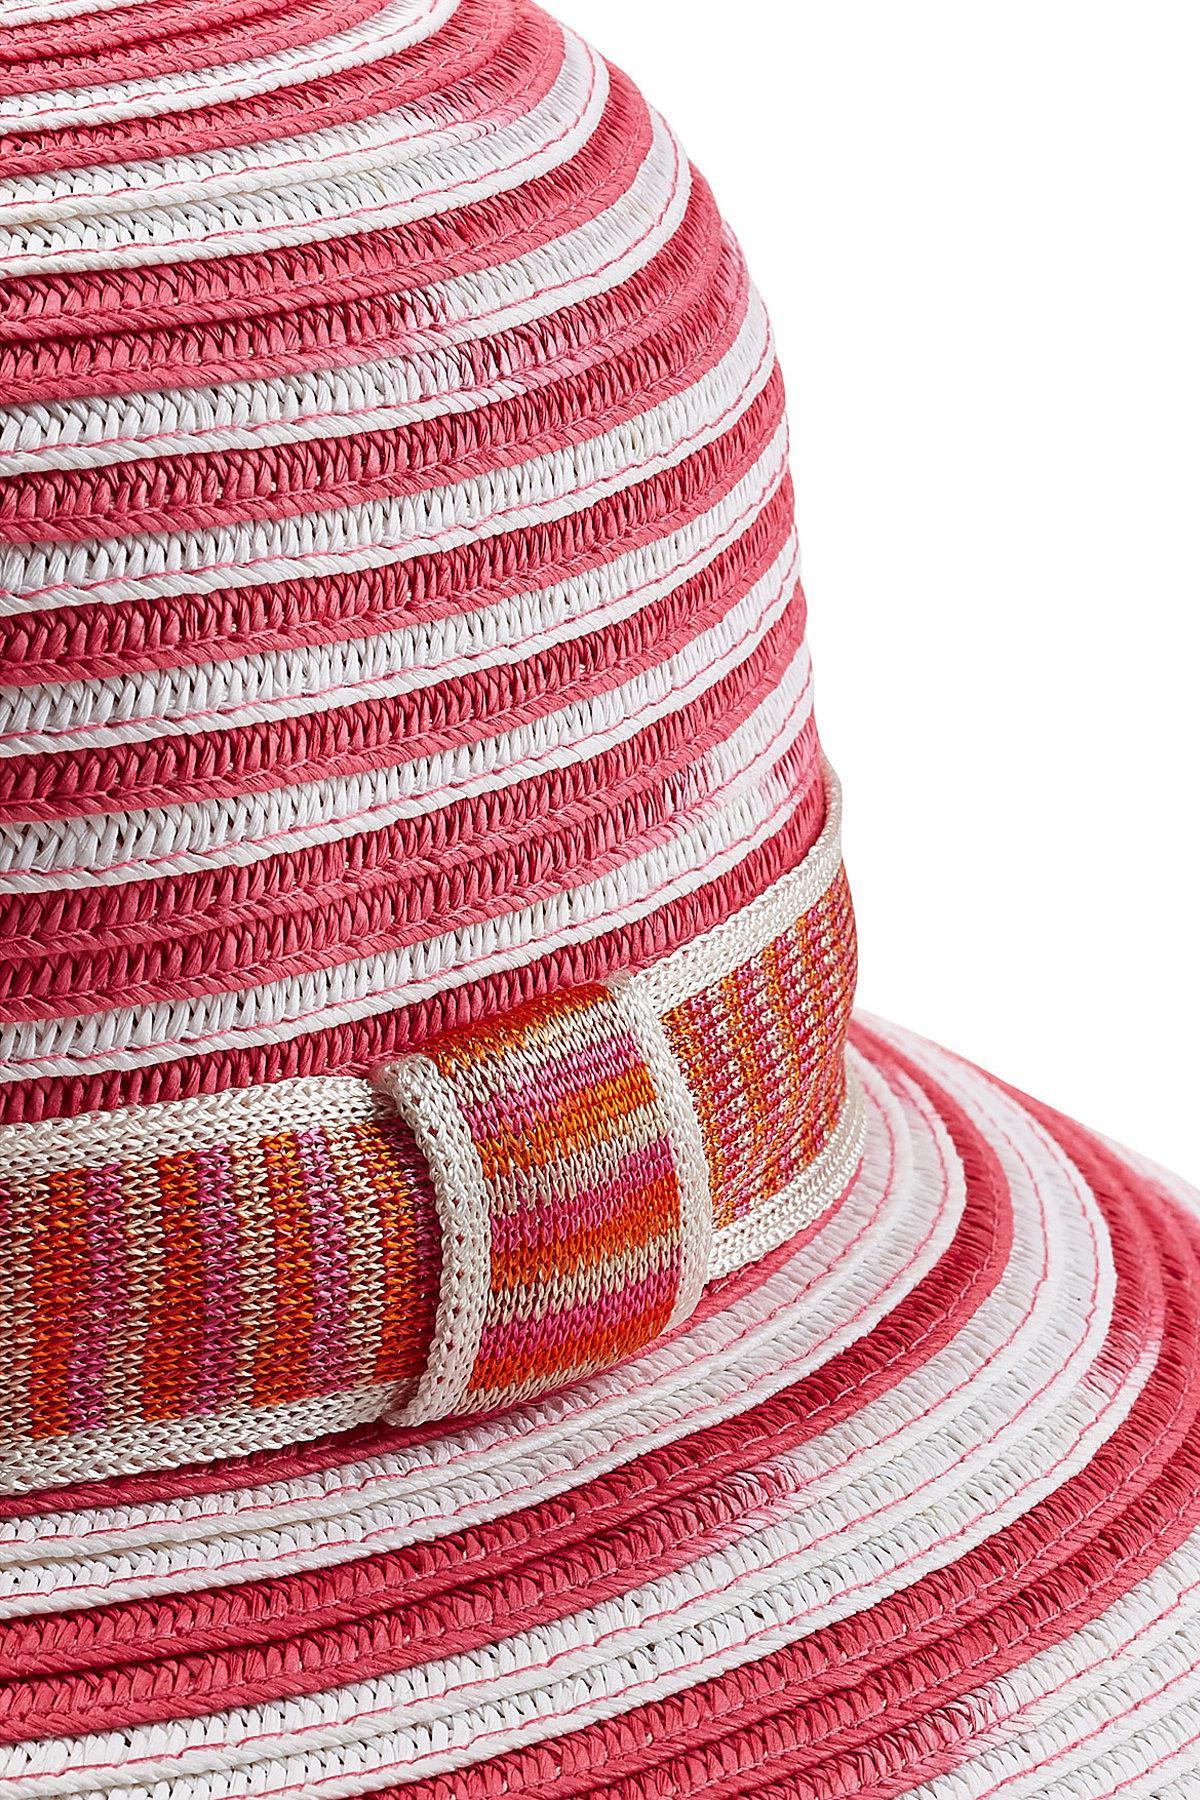 Missoni Straw Hat in Red - Save 24.096385542168676% - Lyst 9e6b156cb2b7